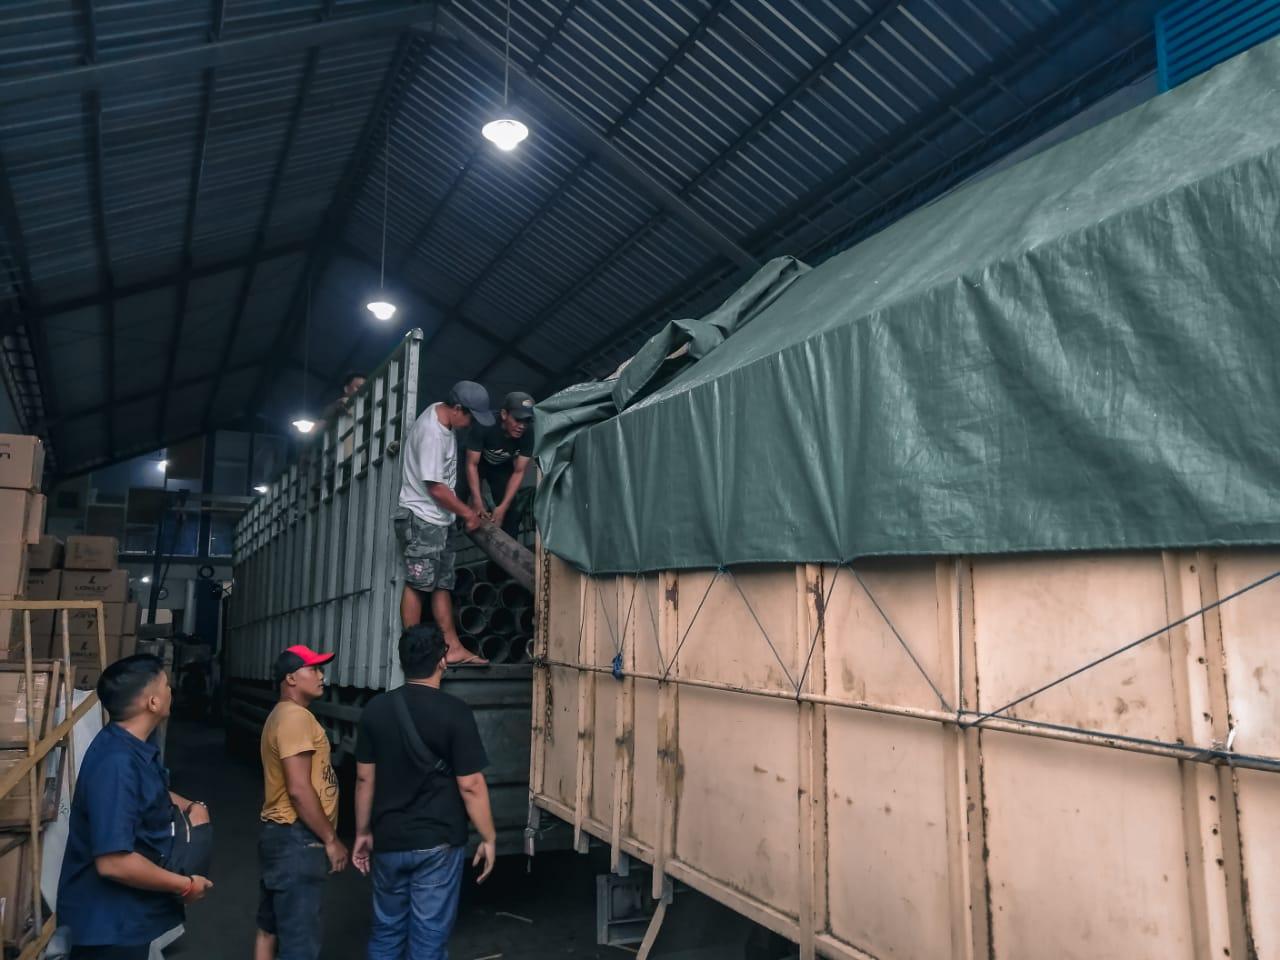 Ekspedisi Pengiriman Barang Mojokerto ke Malili Sulawesi Selatan